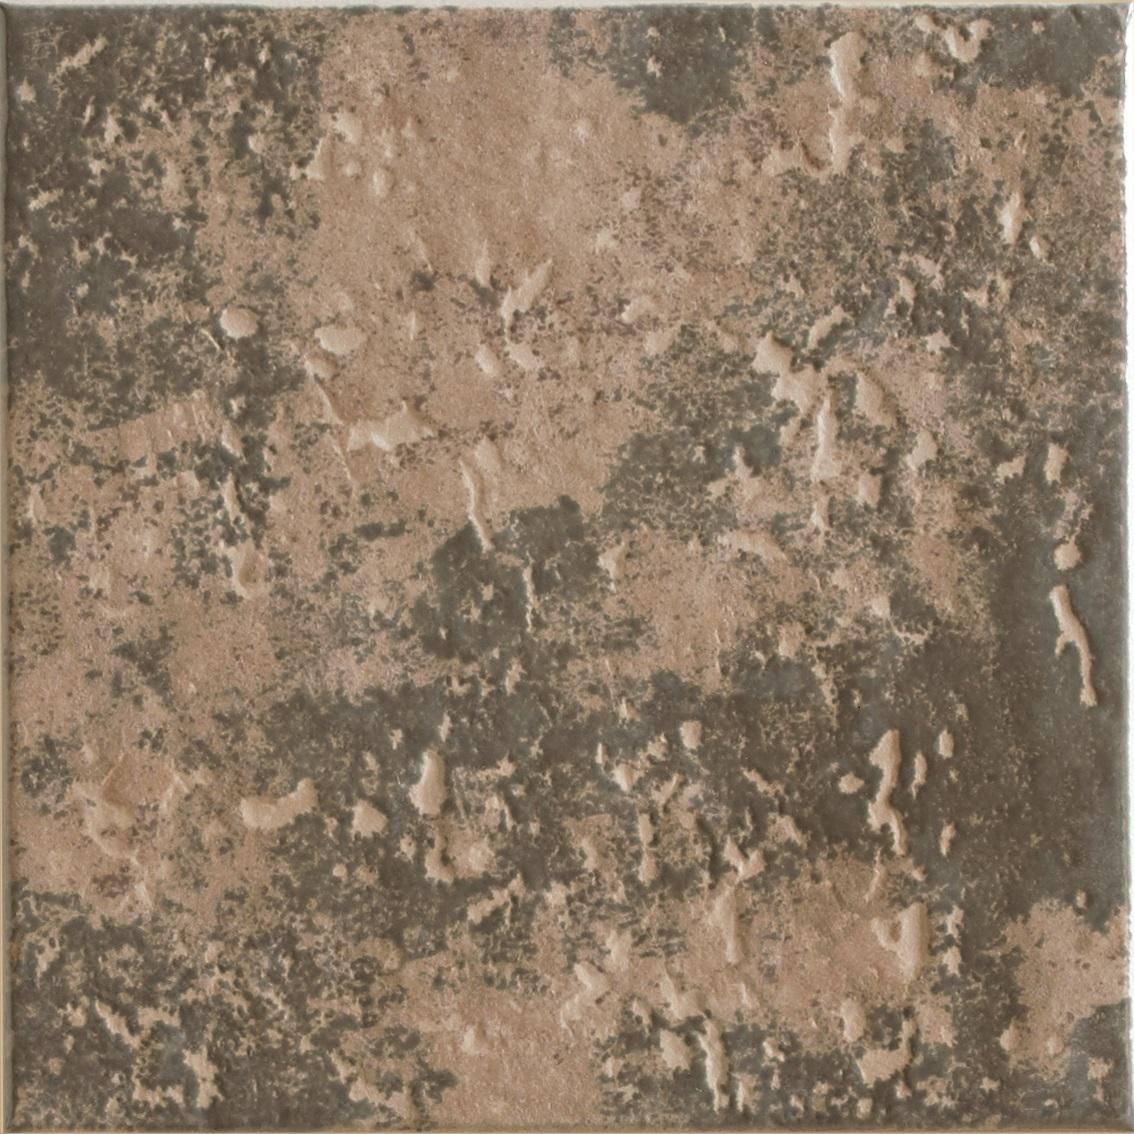 52a Provence gris 20x20 - Hansas Plaadimaailm